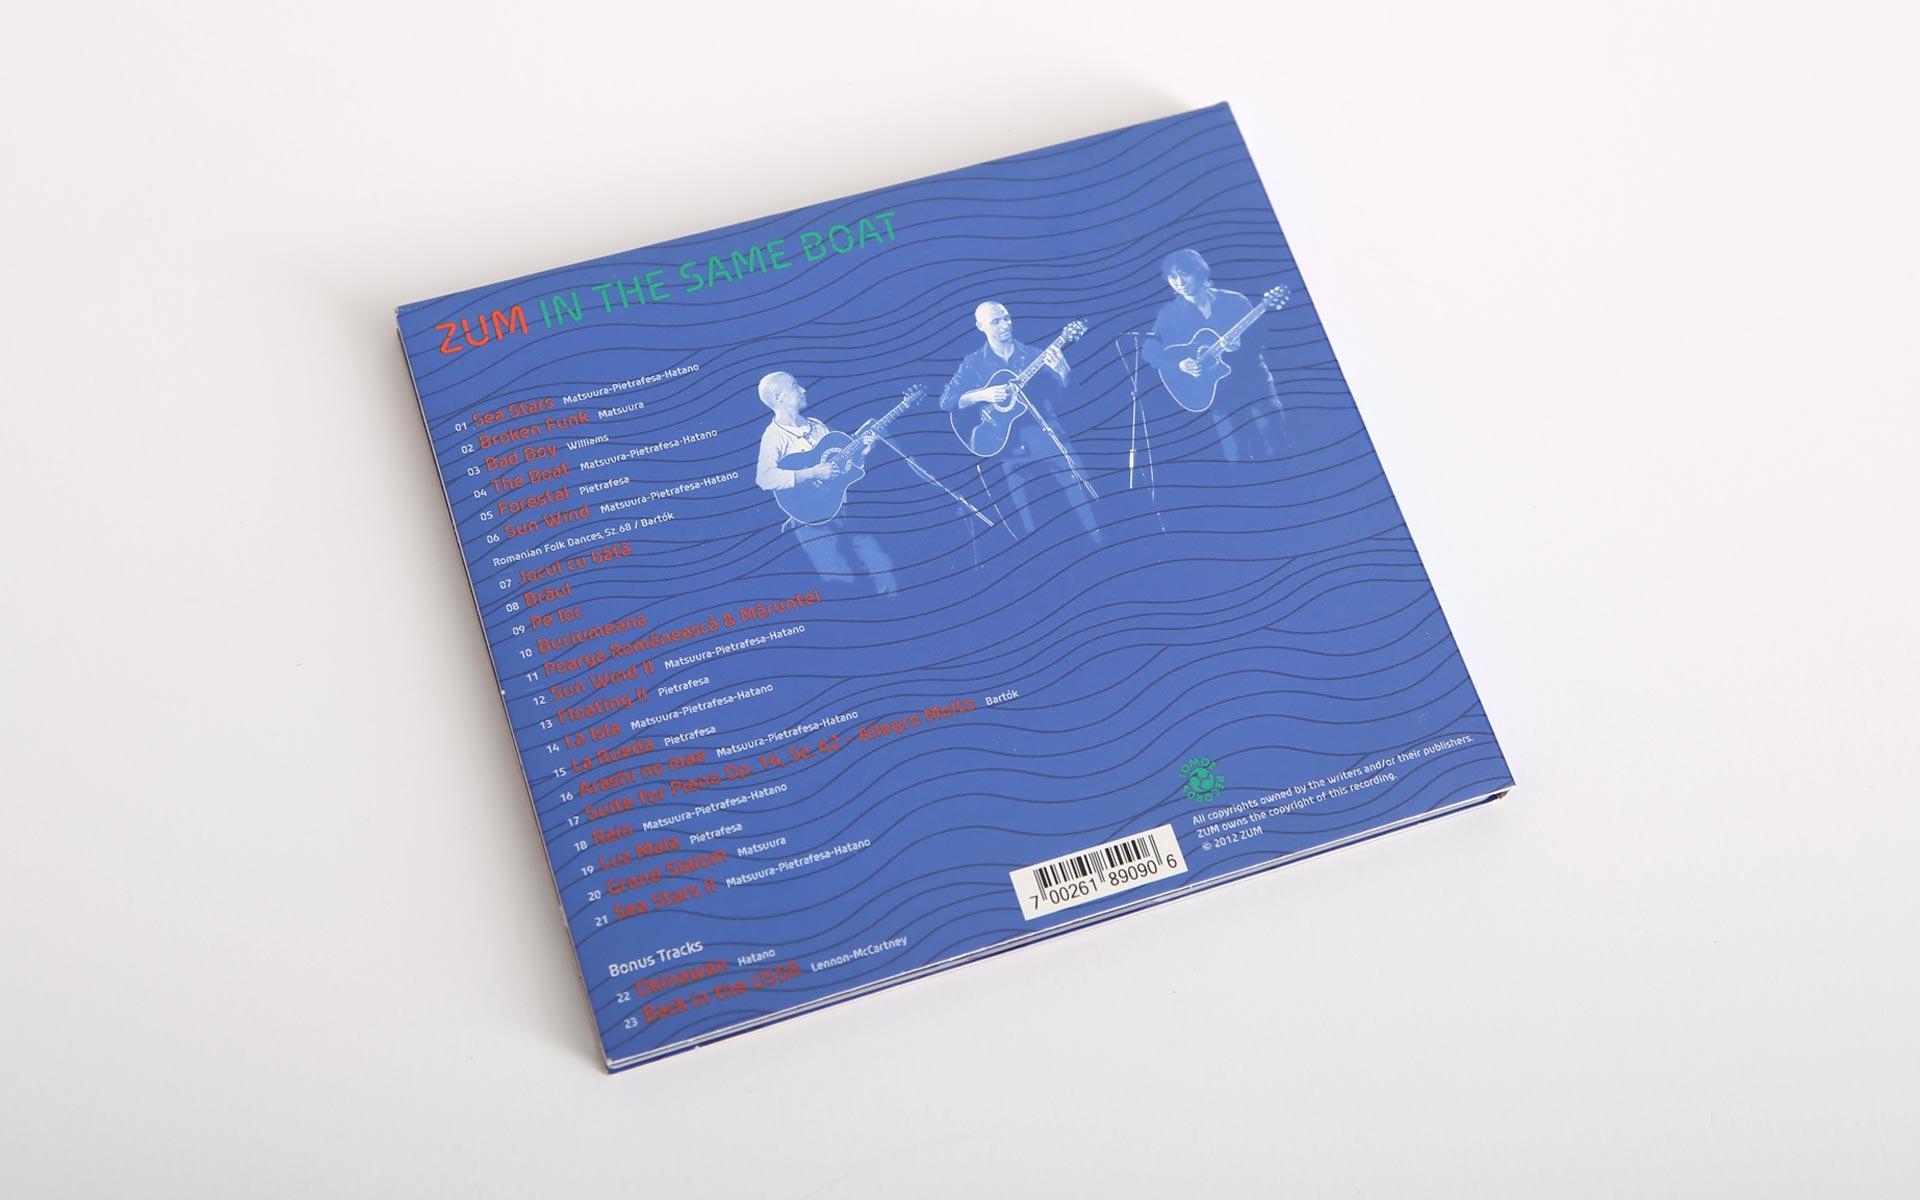 zum-guitar-trio-cd-design-3